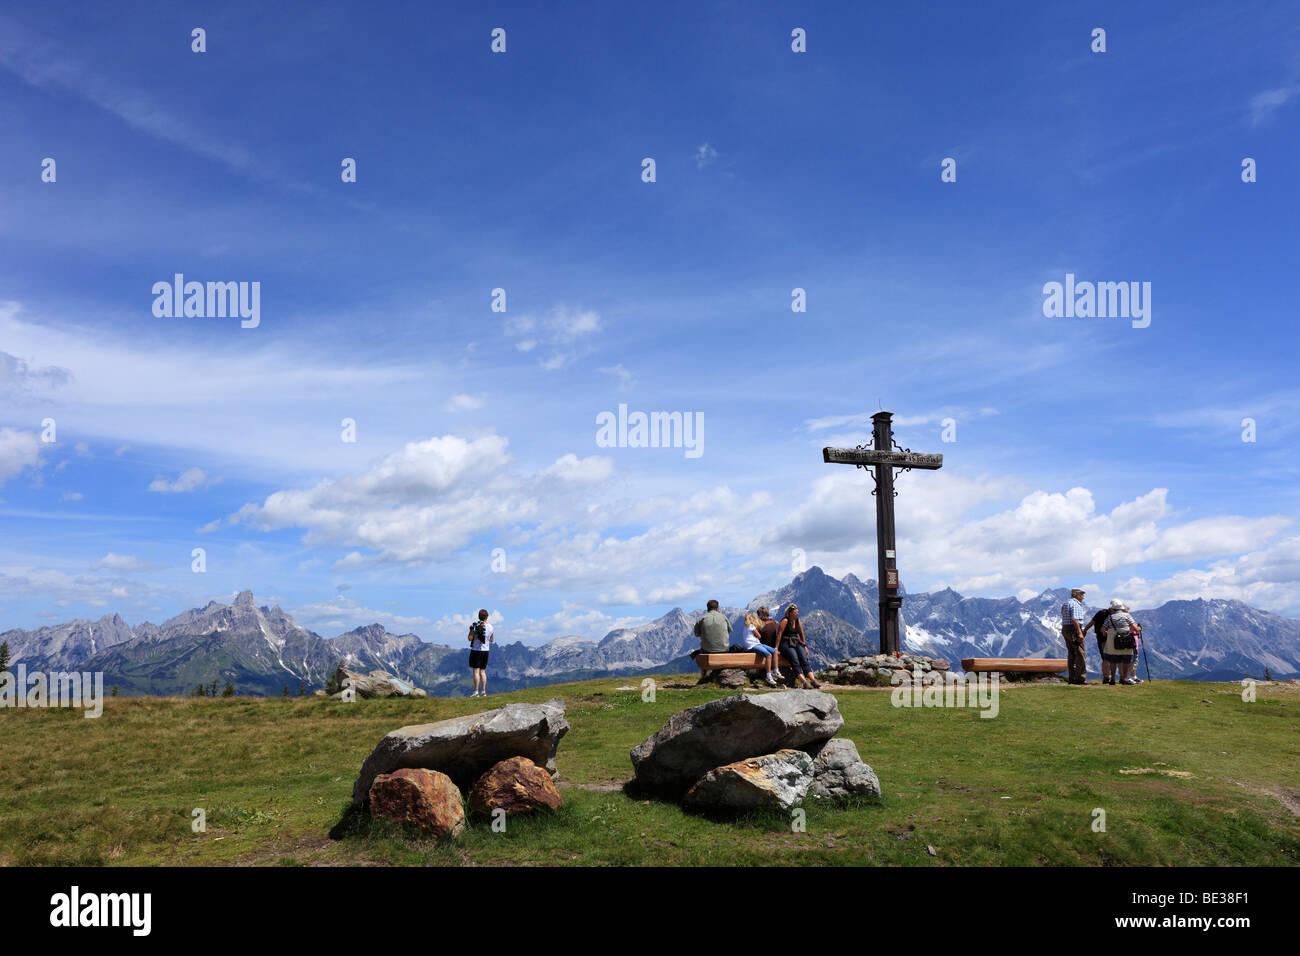 Summit cross on Mt. Rossbrand, in the back Mt. Dachstein, Pongau, Land Salzburg, Salzburg, Austria, Europe Stock Photo